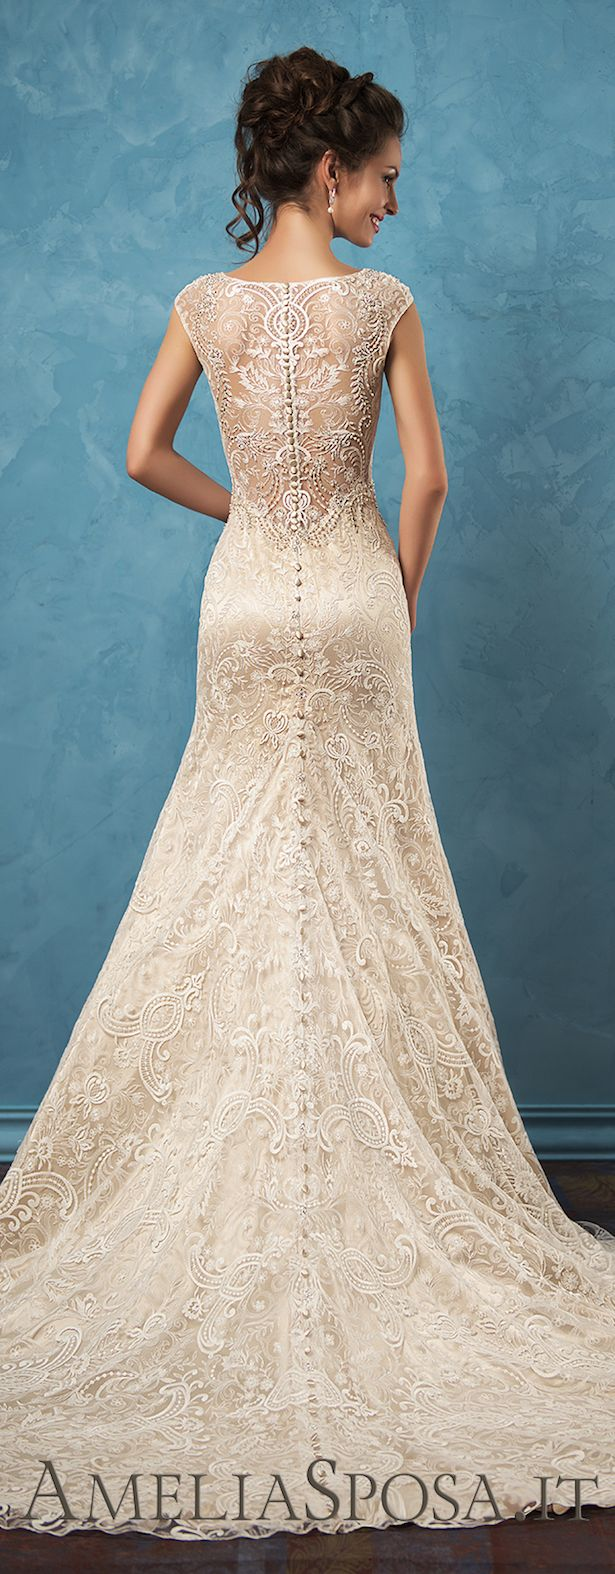 95 best Sonho de noiva images on Pinterest | Wedding ideas, Bridal ...